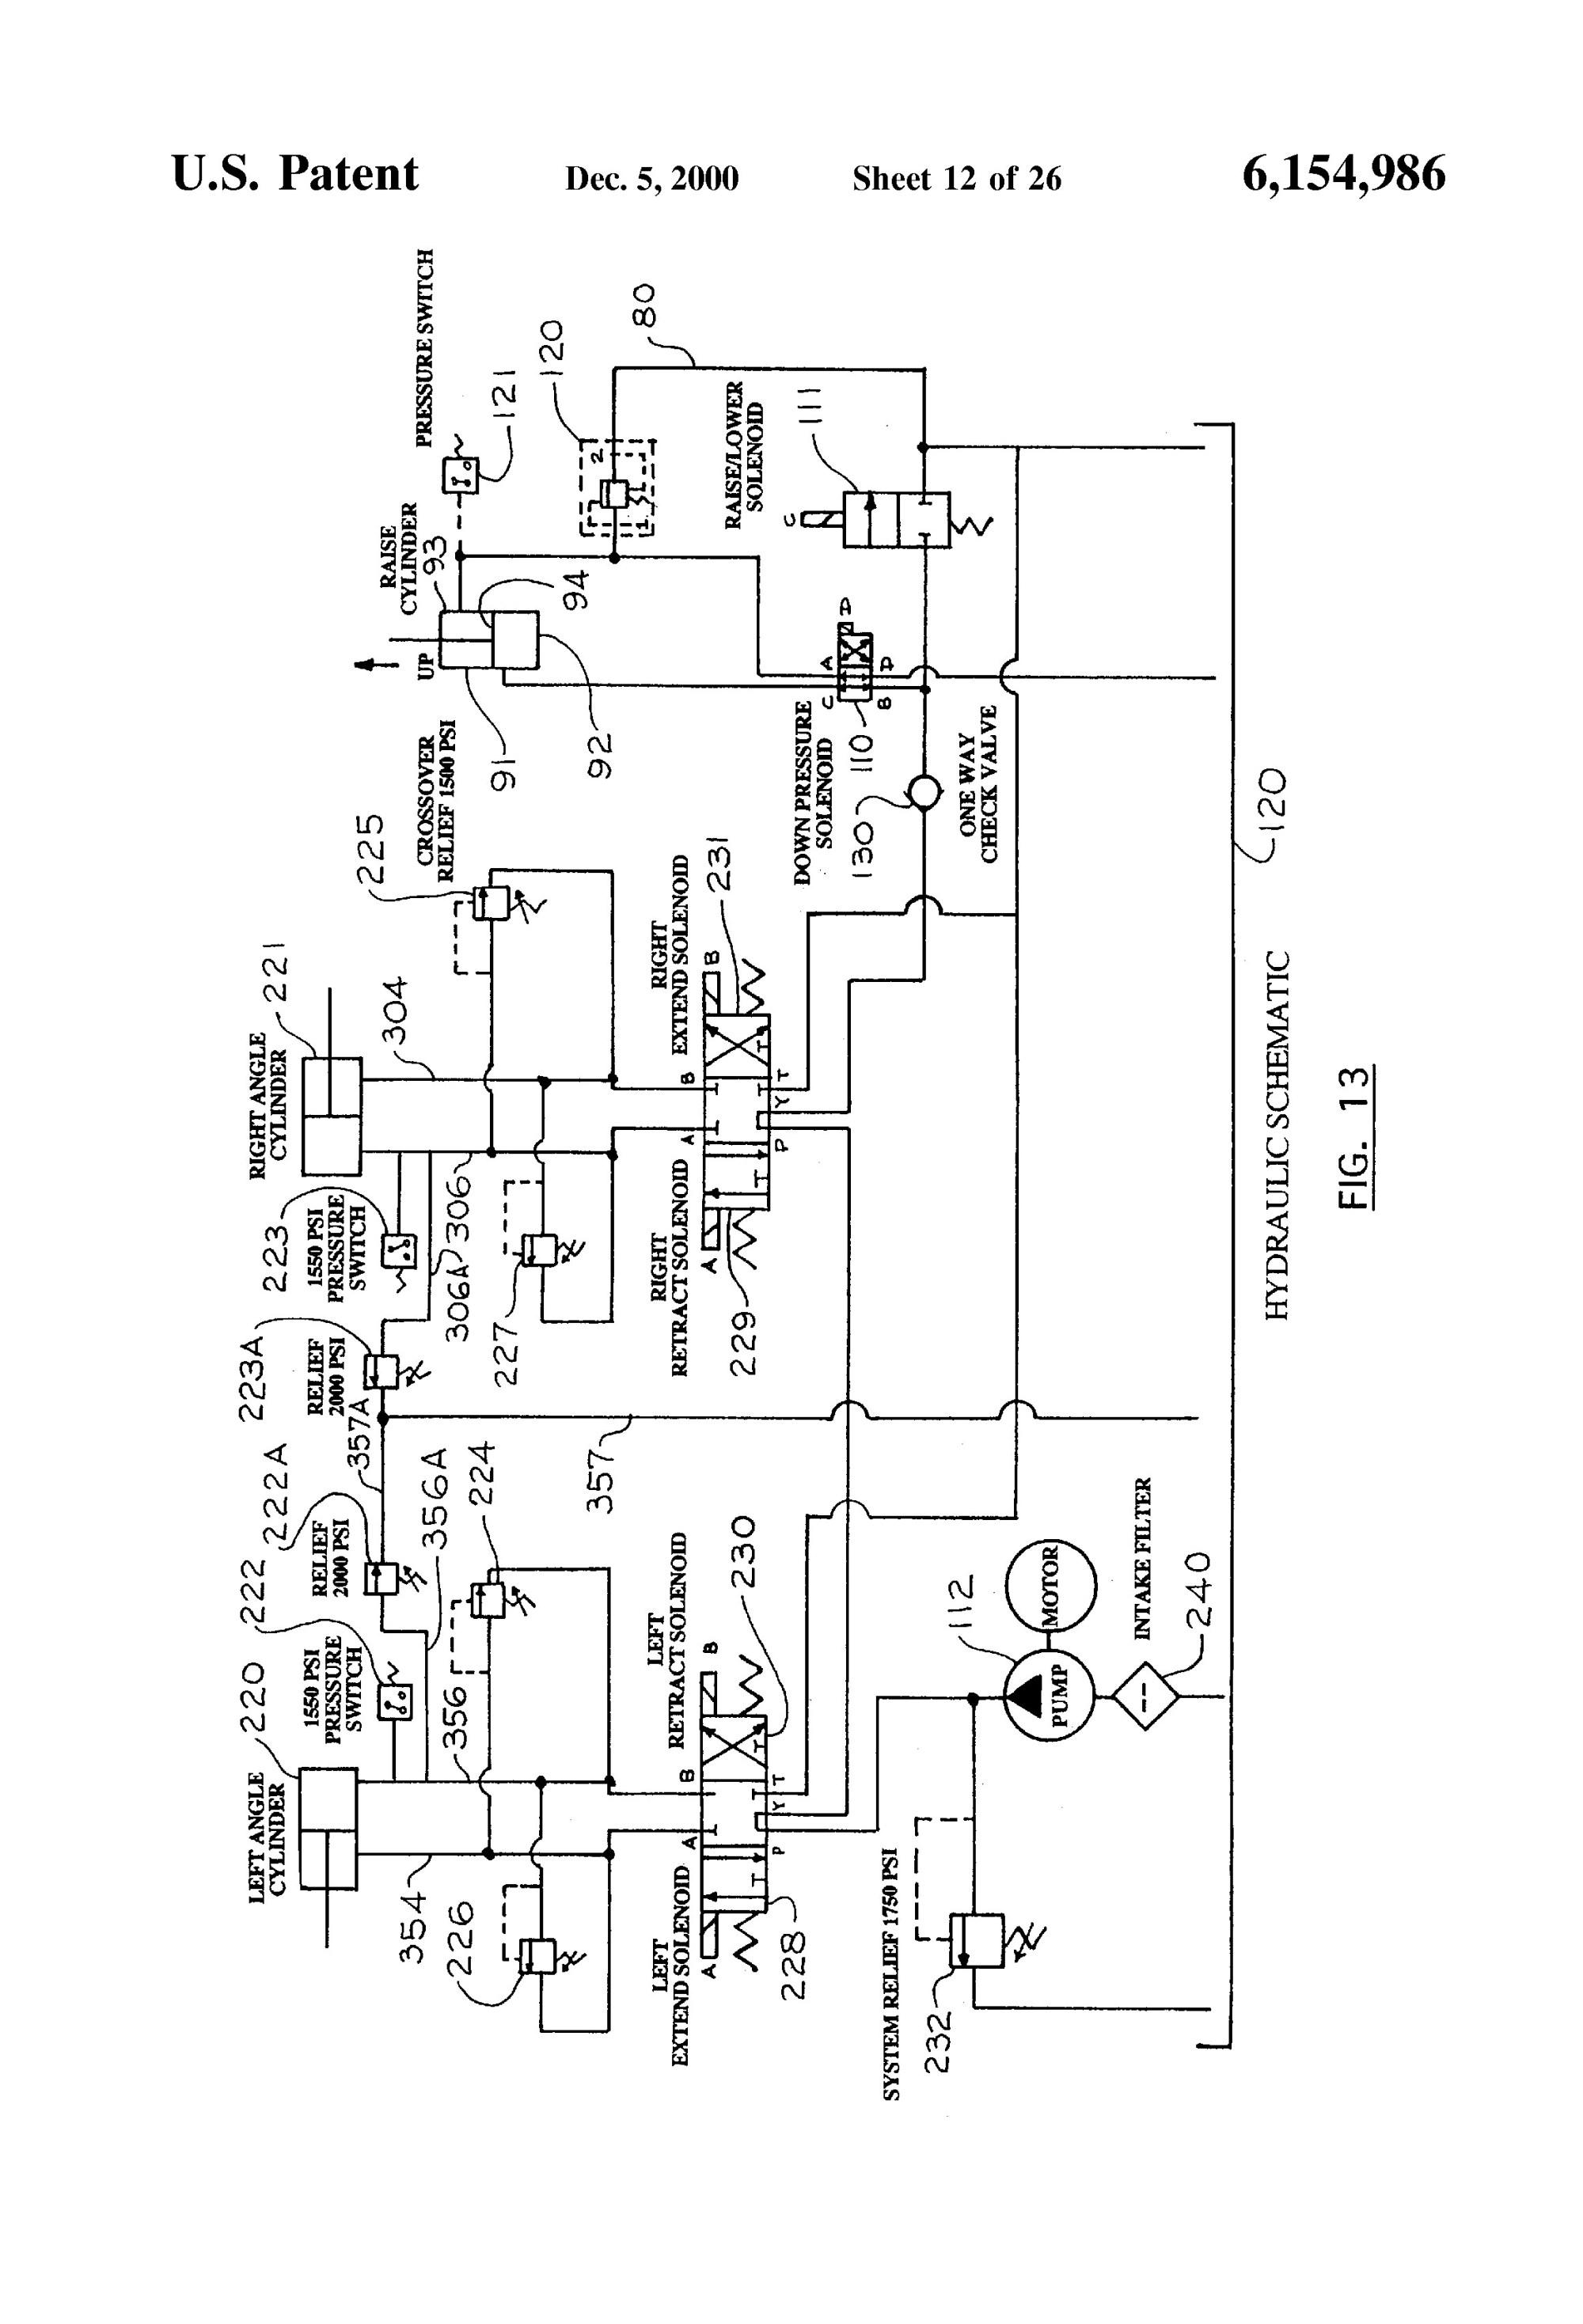 hight resolution of snow way wiring diagram snow diagrams snoway plow massey ferguson tractor sno control curtis sno pro 3000